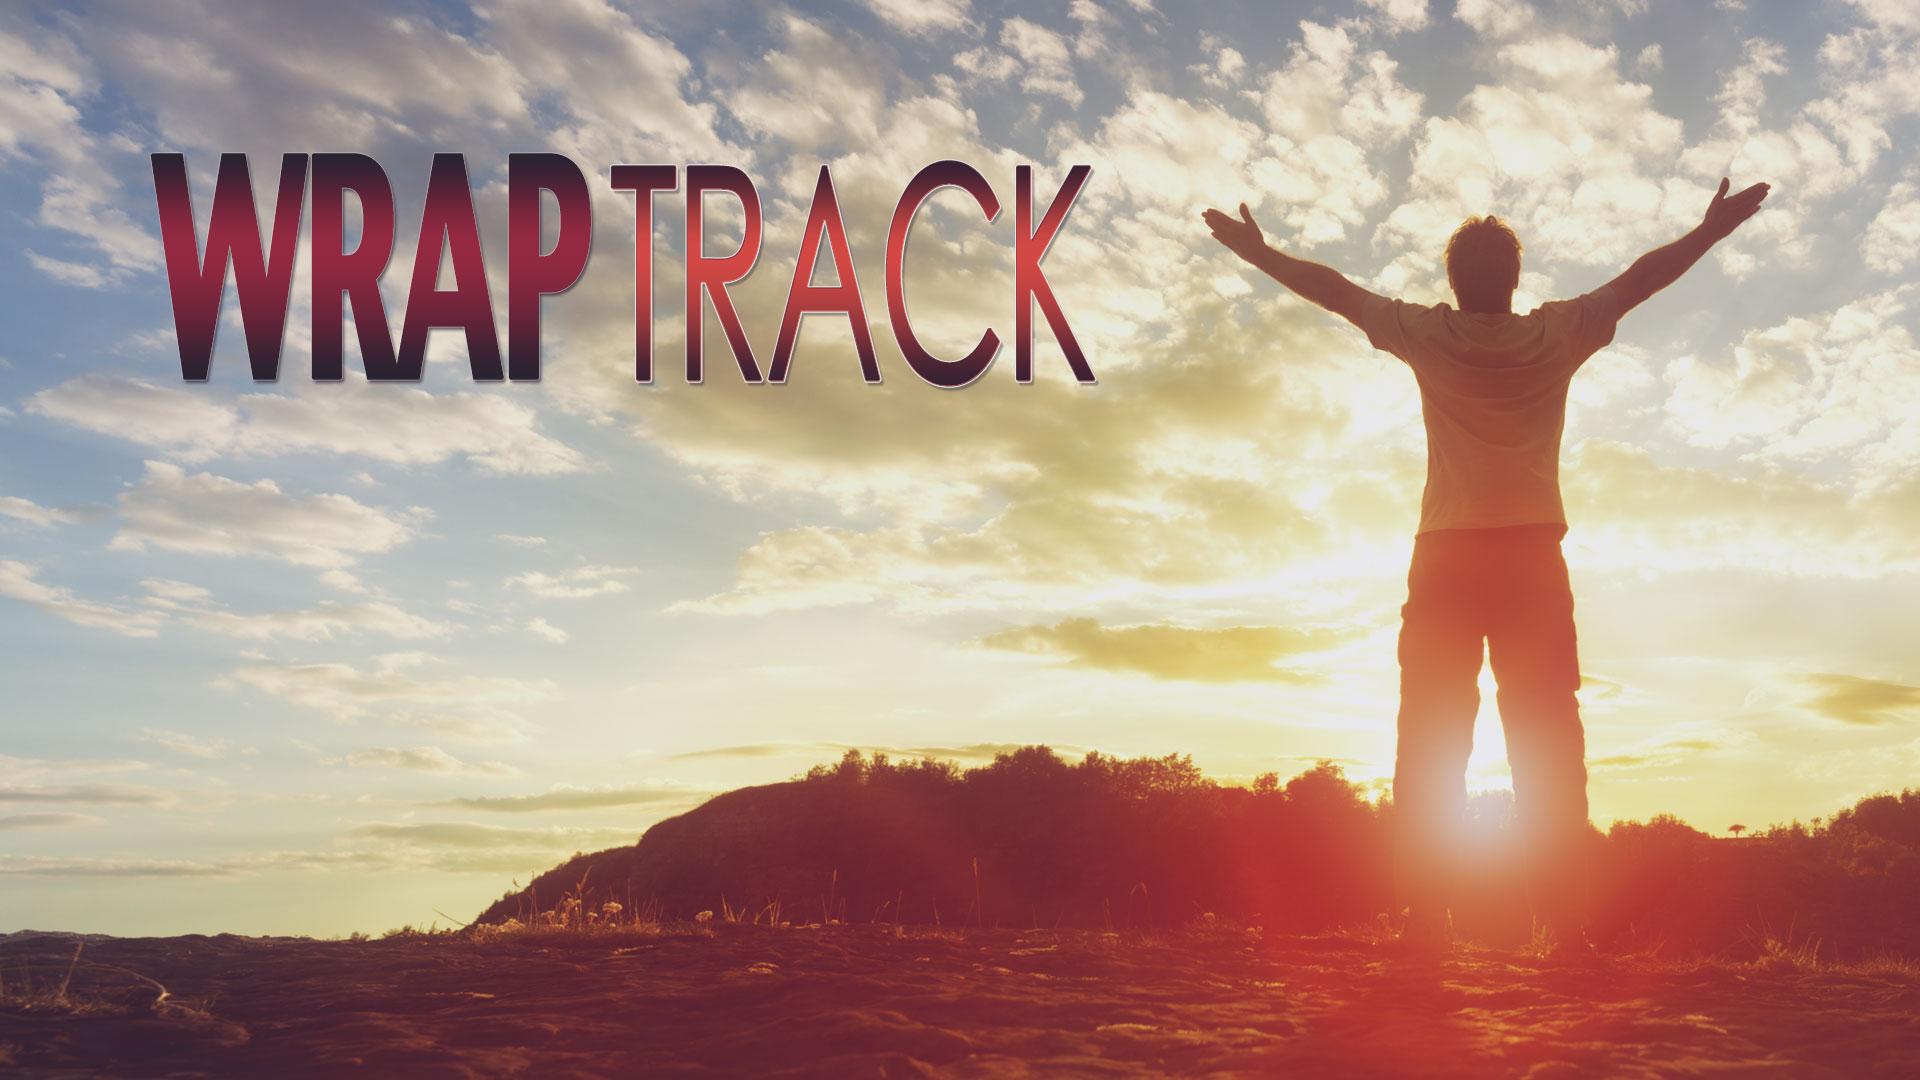 gwc-wrap-track-begins-banner-2015